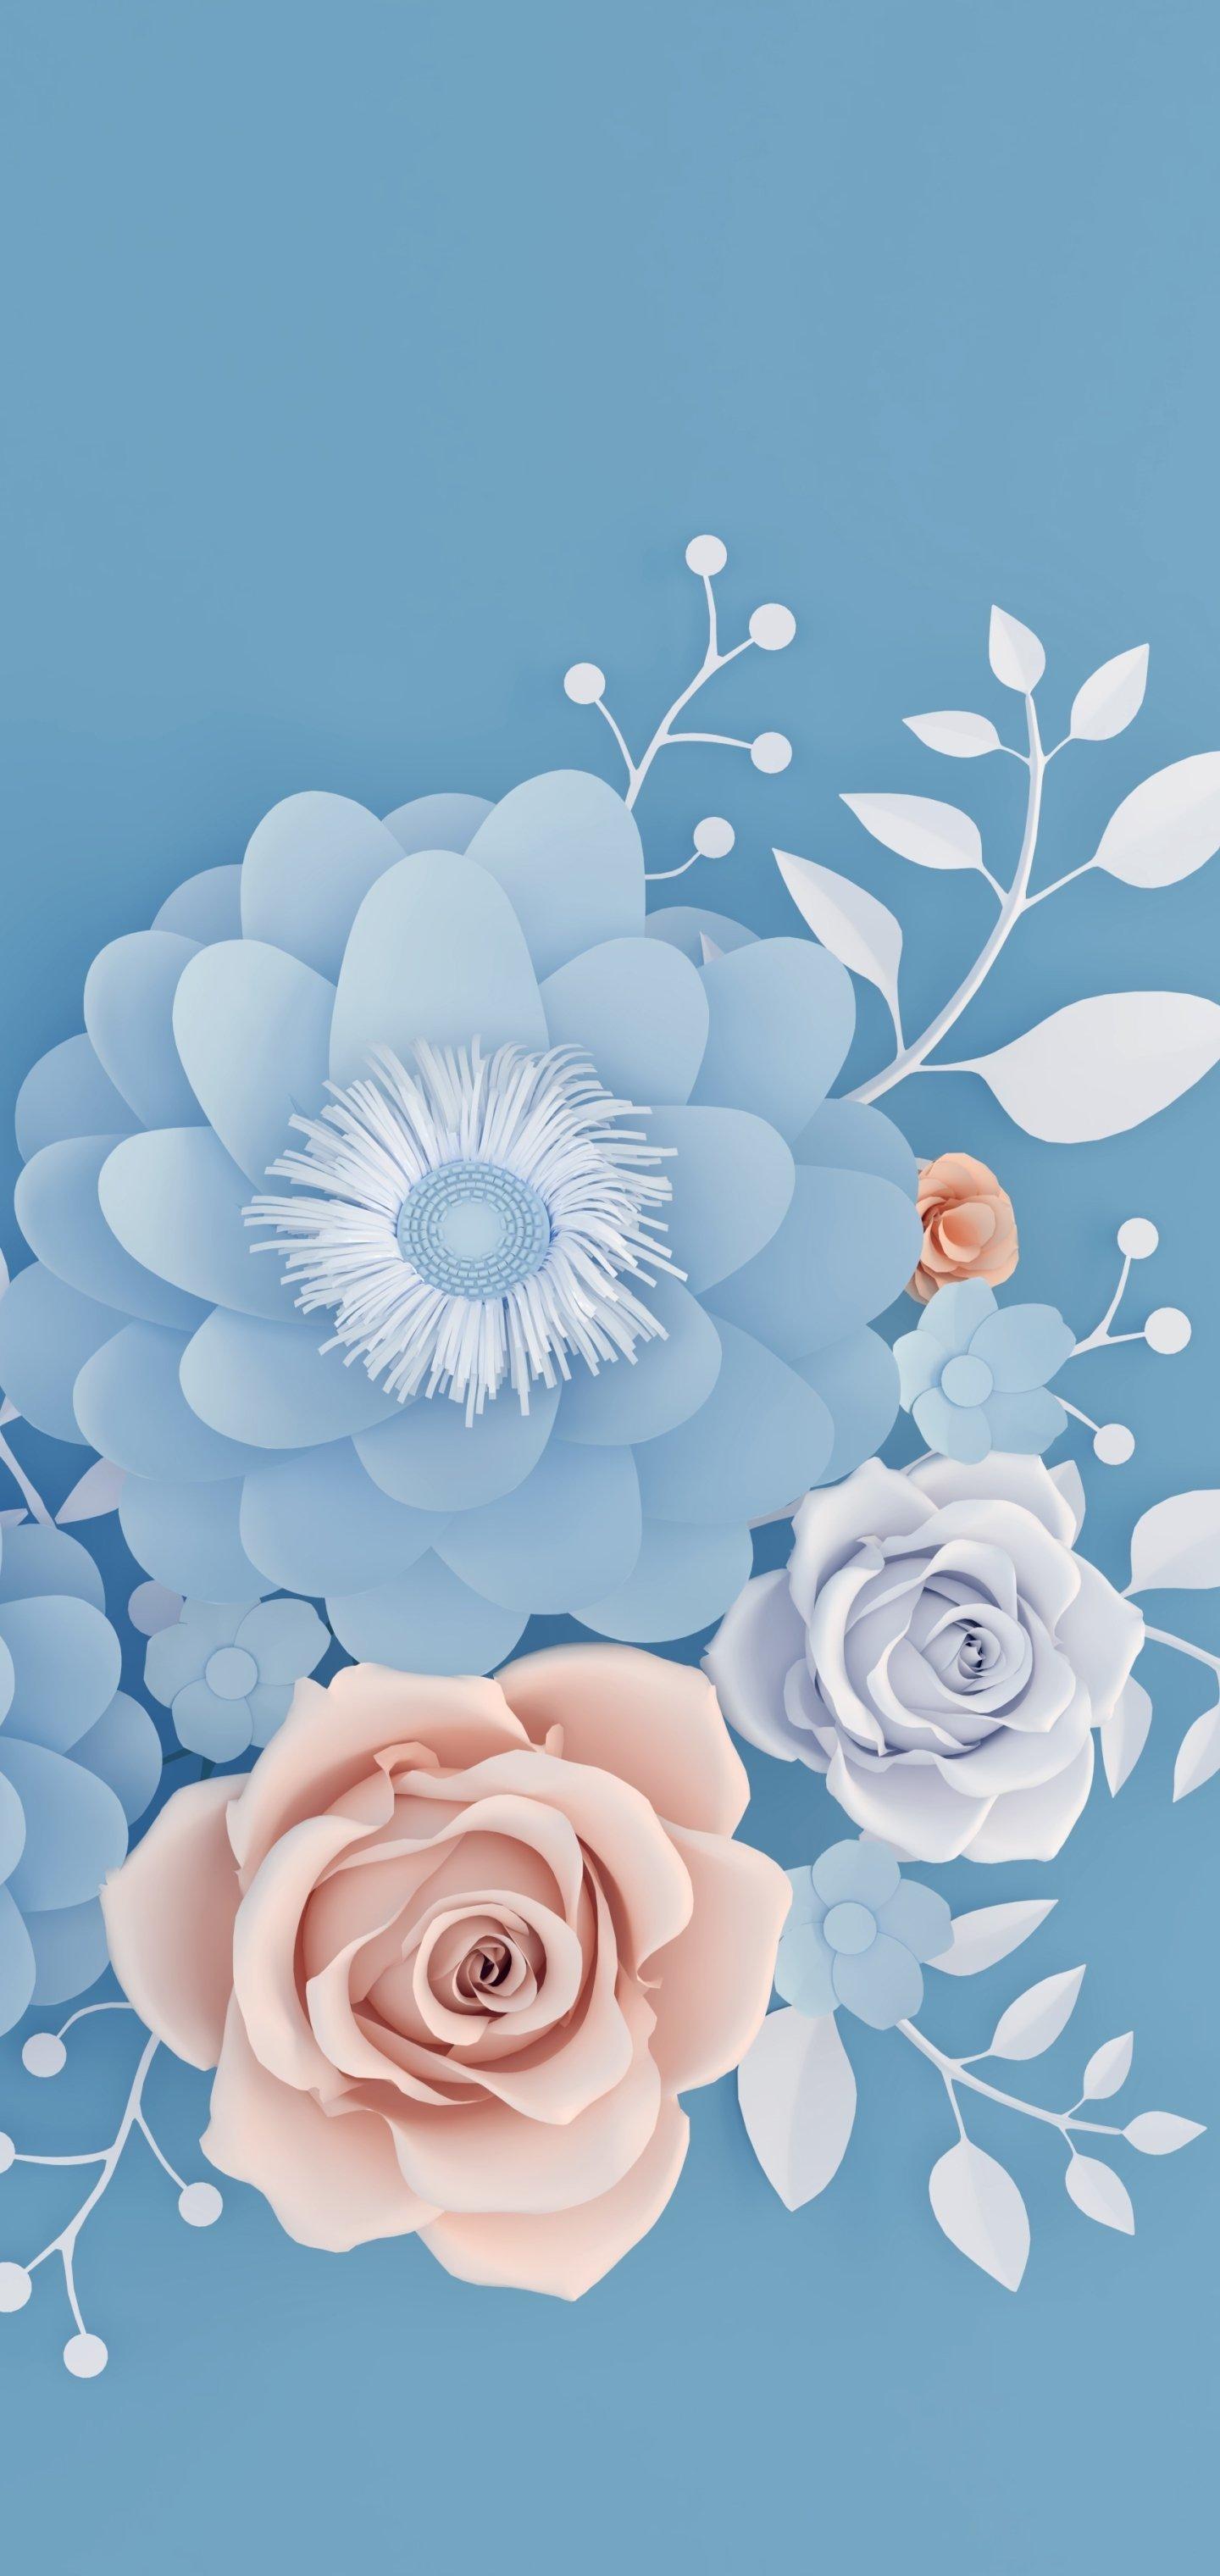 Wallpaper 841696